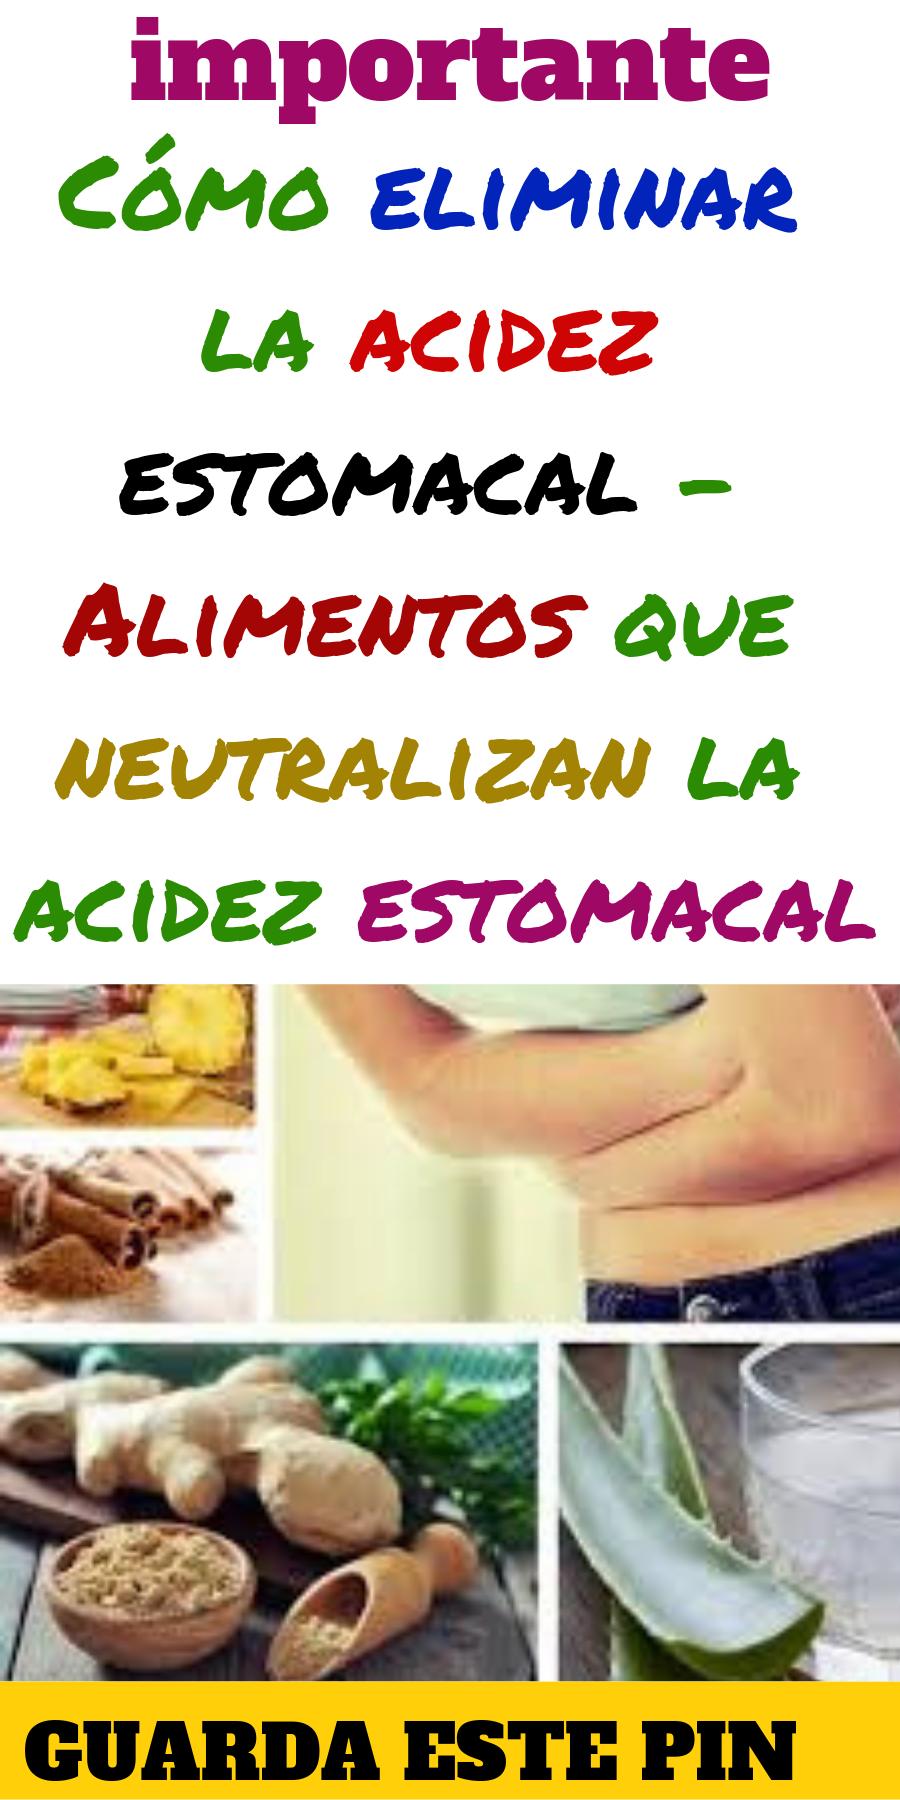 Como Eliminar La Acidez Estomacal Alimentos Que Neutralizan La Acidez Estomacal Acidez Estomacal Alimentos Acidez